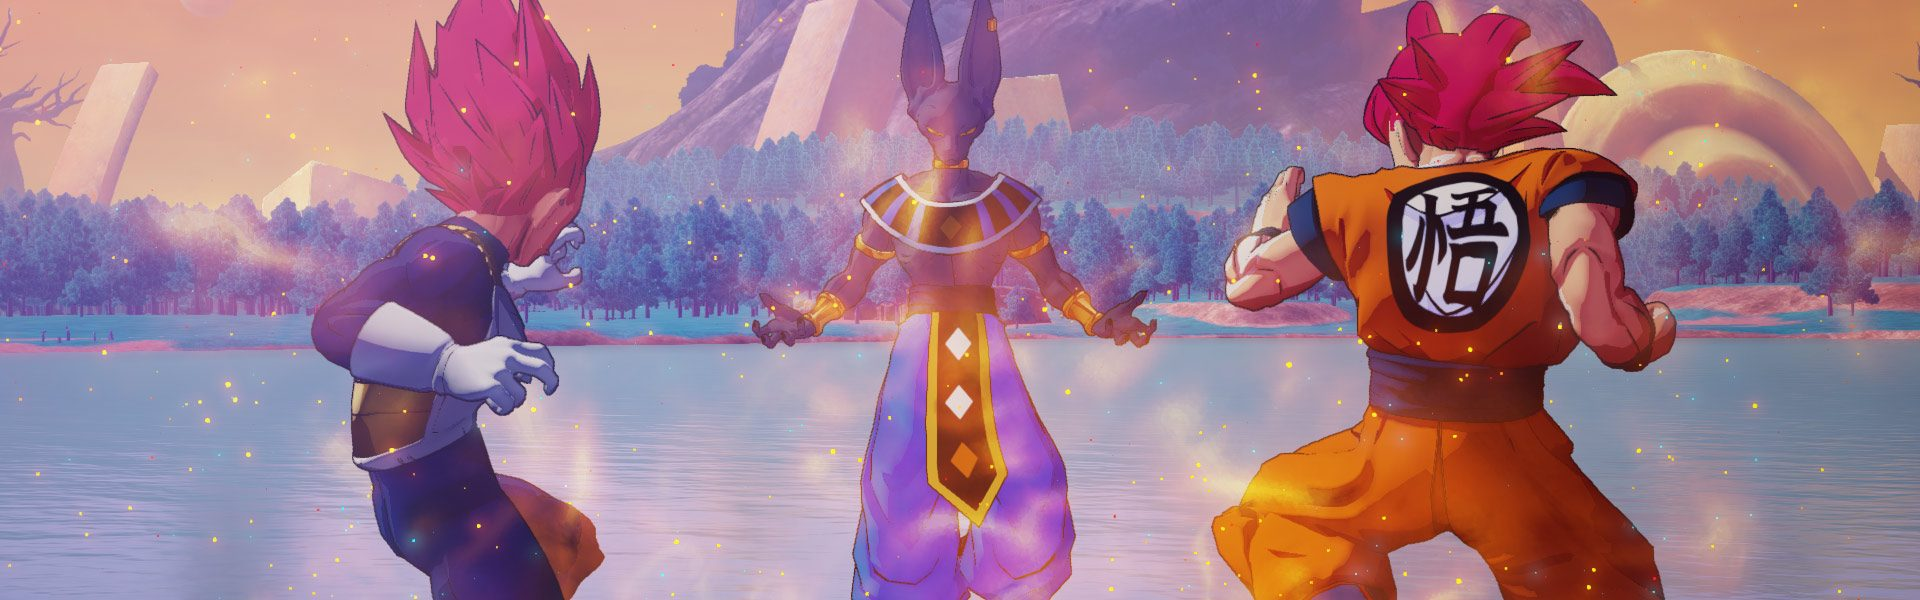 Video's van Dragon ball z battle of gods br